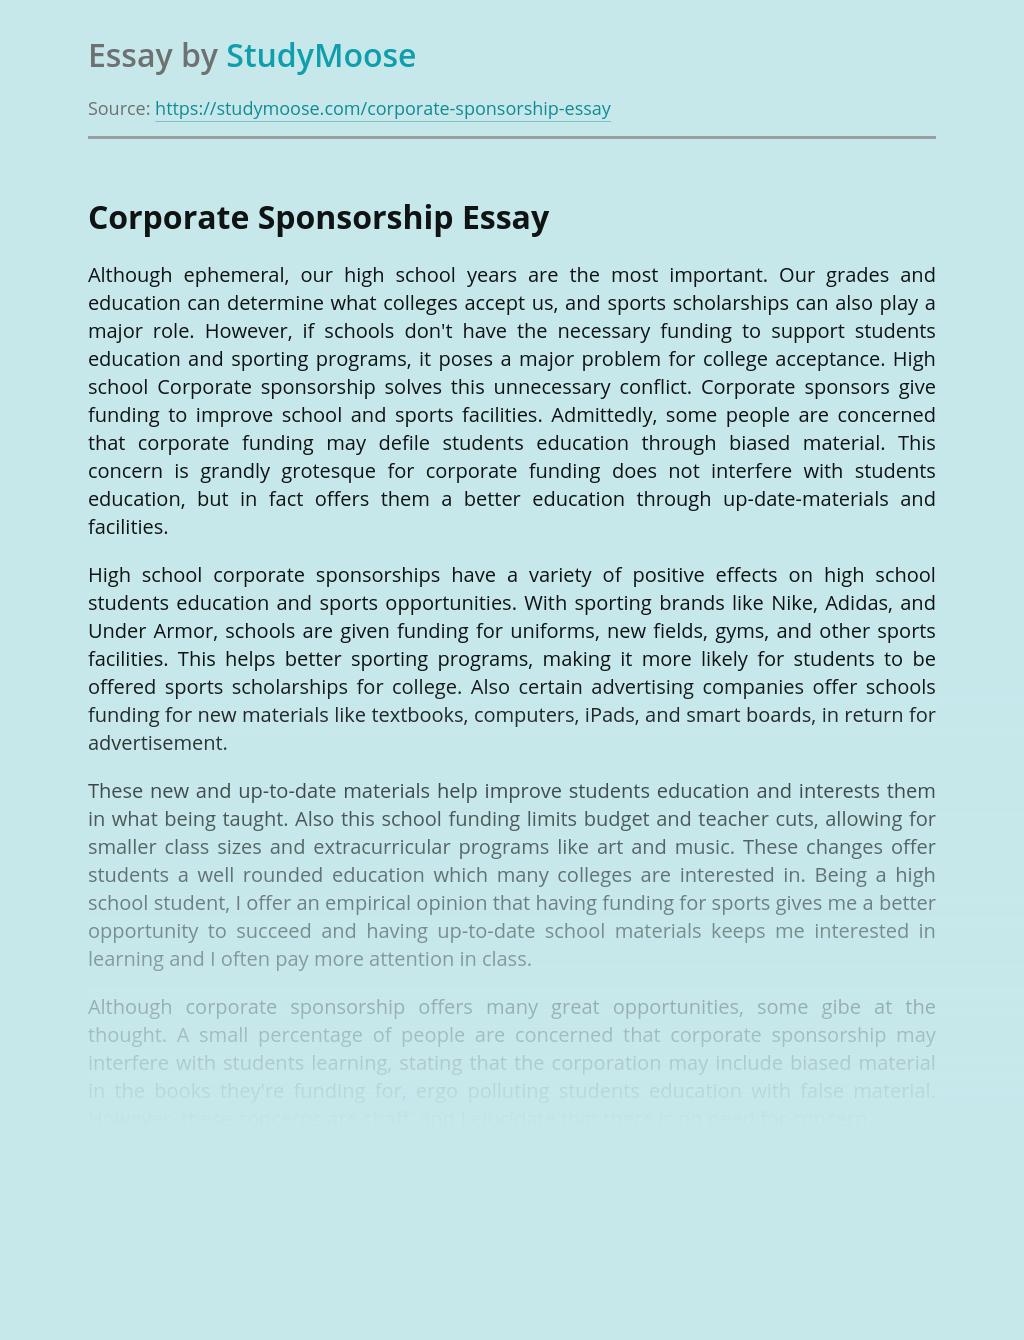 Corporate sponsorships in schools essays soccer coach sample resume